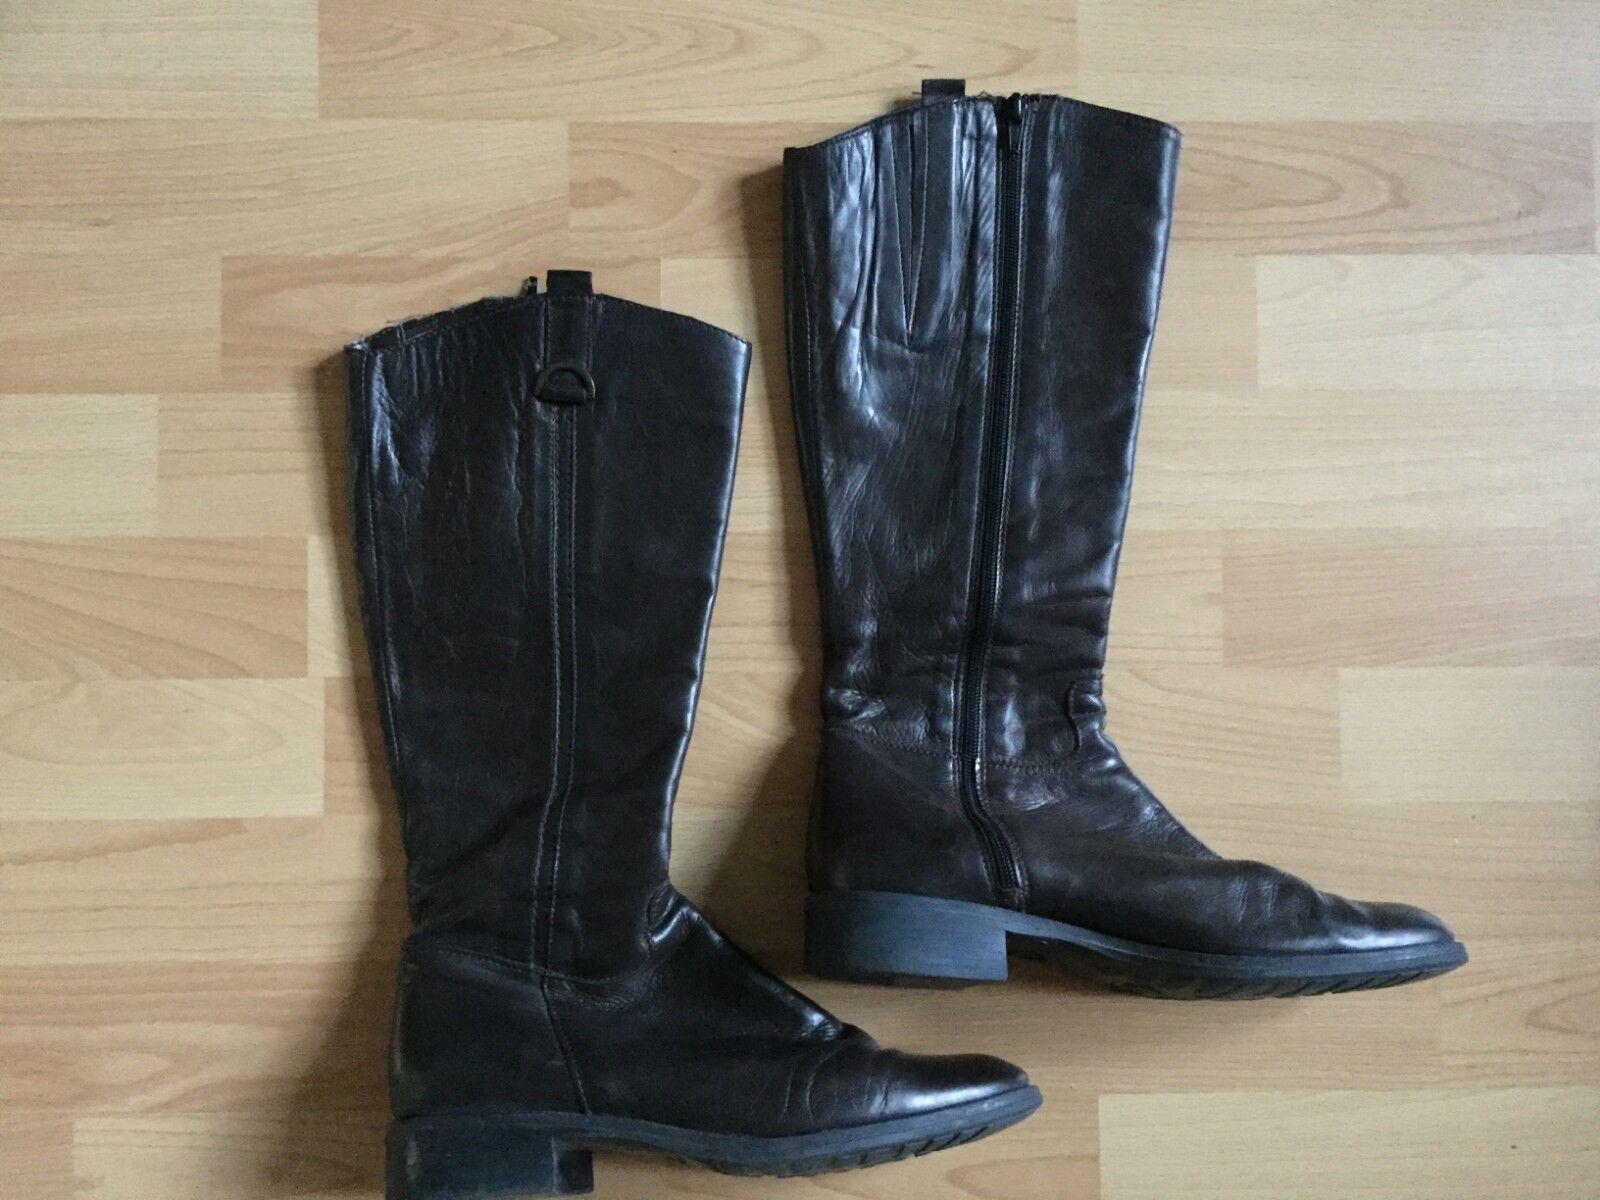 Lavoraziome Argentina Damenstiefel Damenstiefel Damenstiefel Stiefel Gr. 40 braun Leder Schuhe Damenschu10 3cfaf4